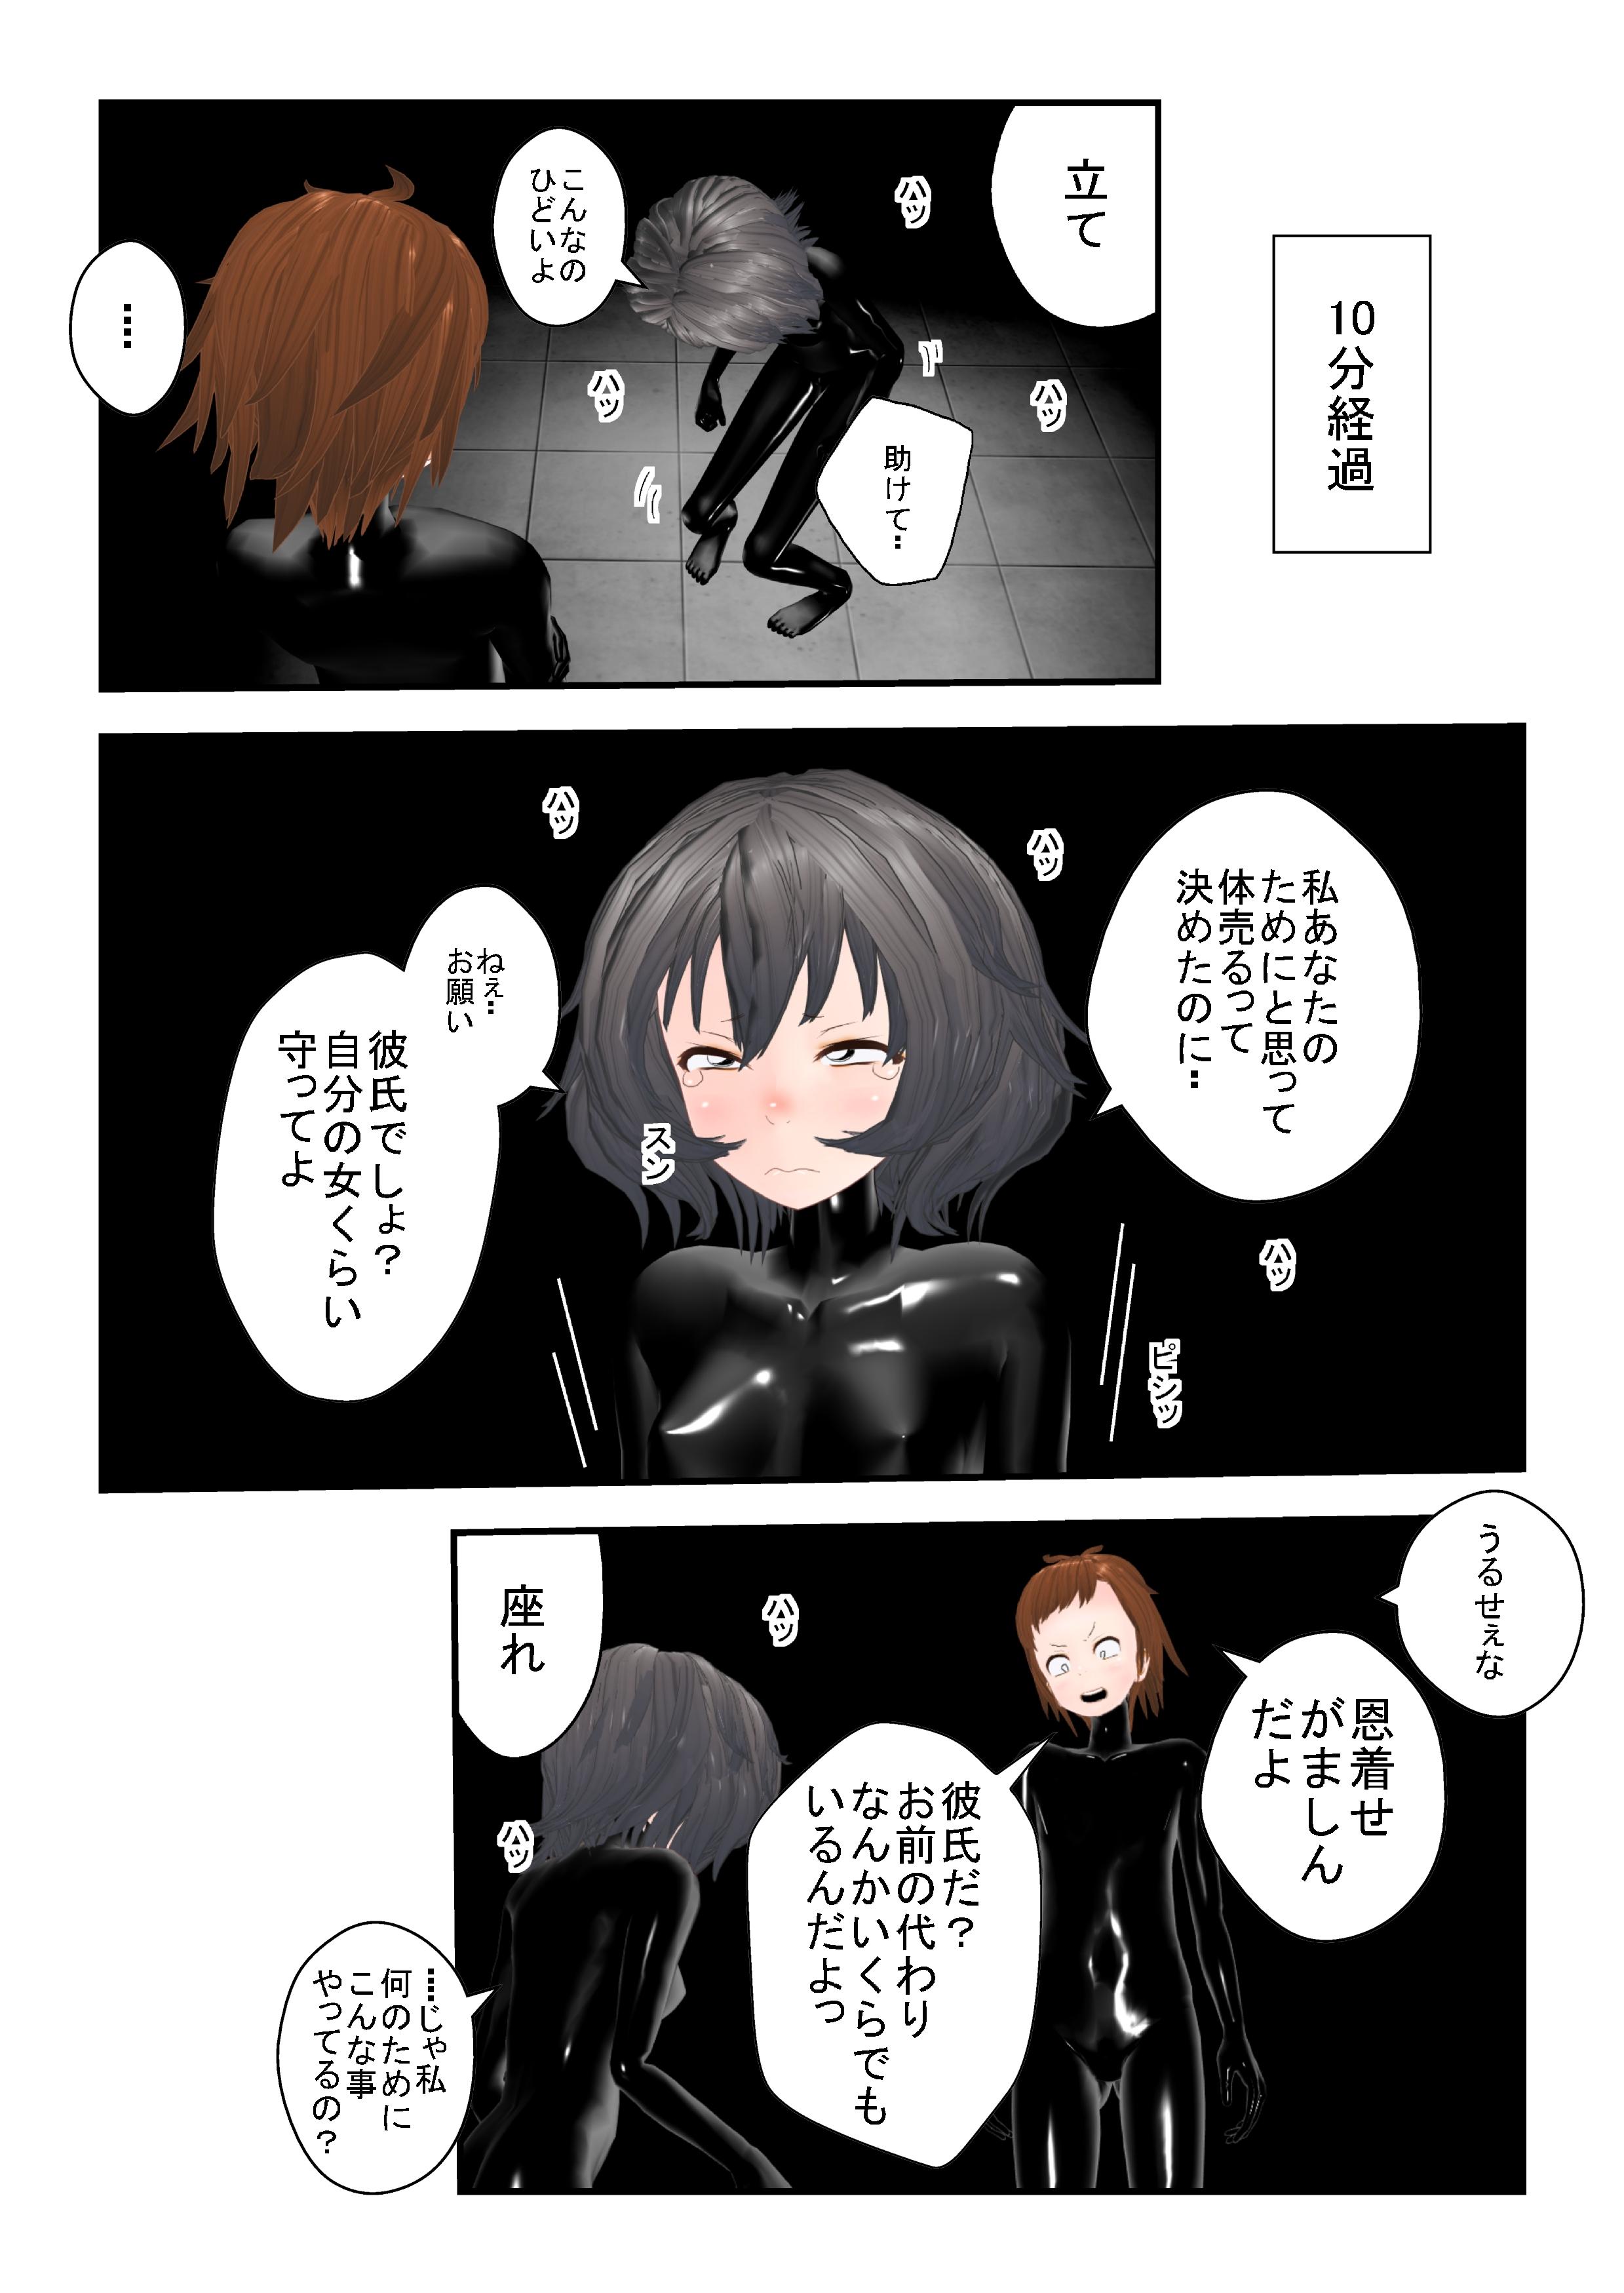 shi_0004.jpg